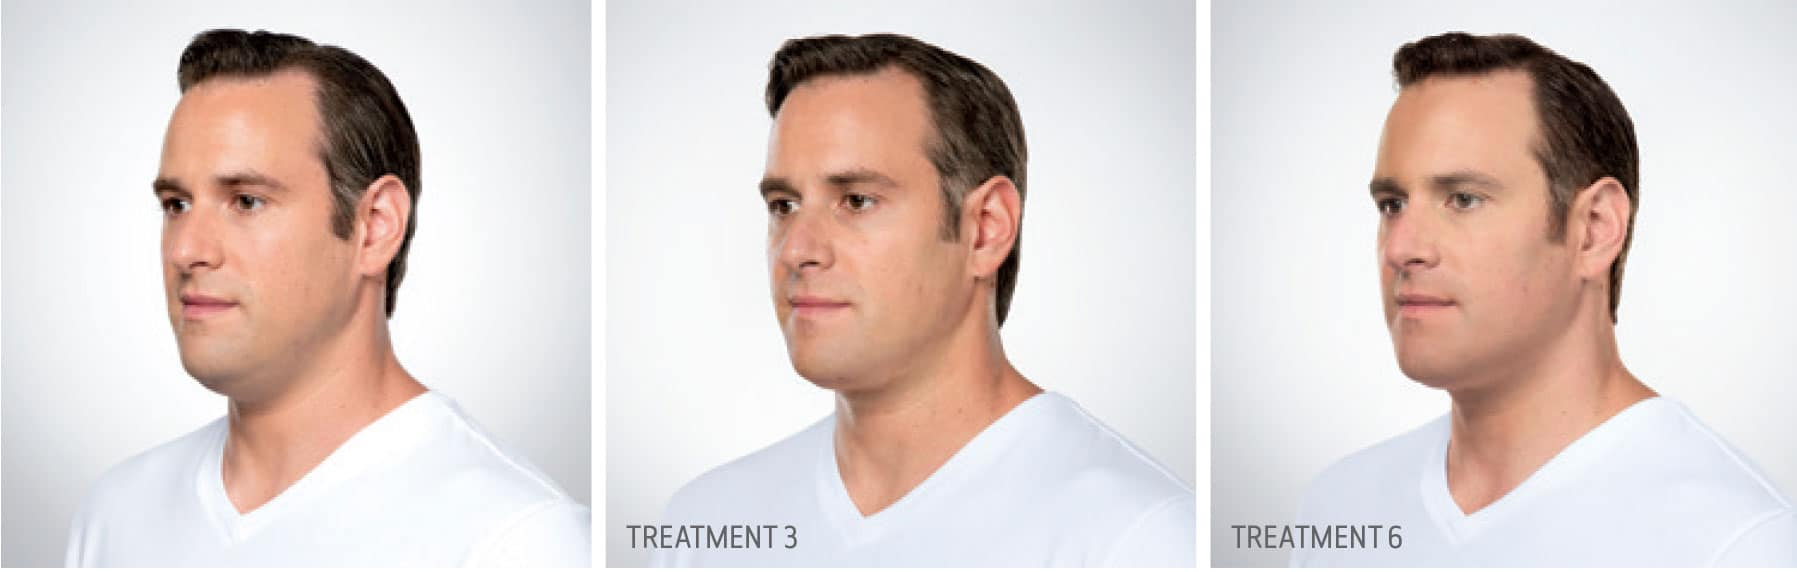 Kybella Treatment for Men